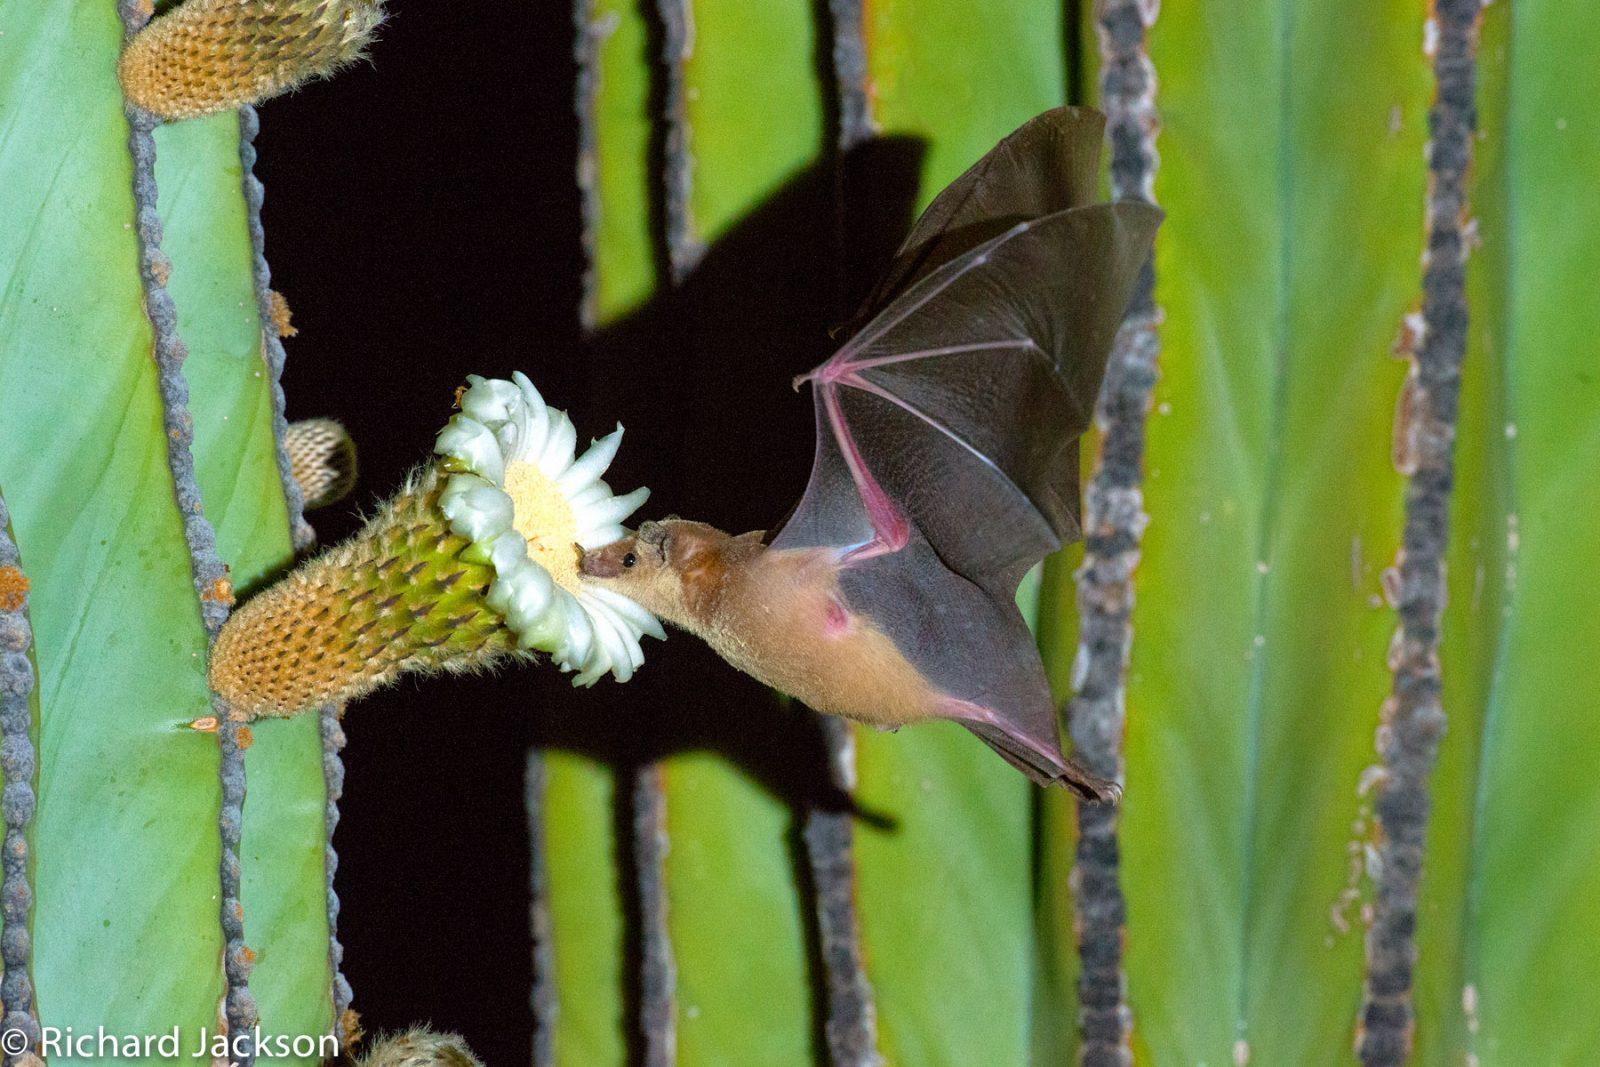 UC Natural Reserve System gains sister reserve in Baja California Sur 10